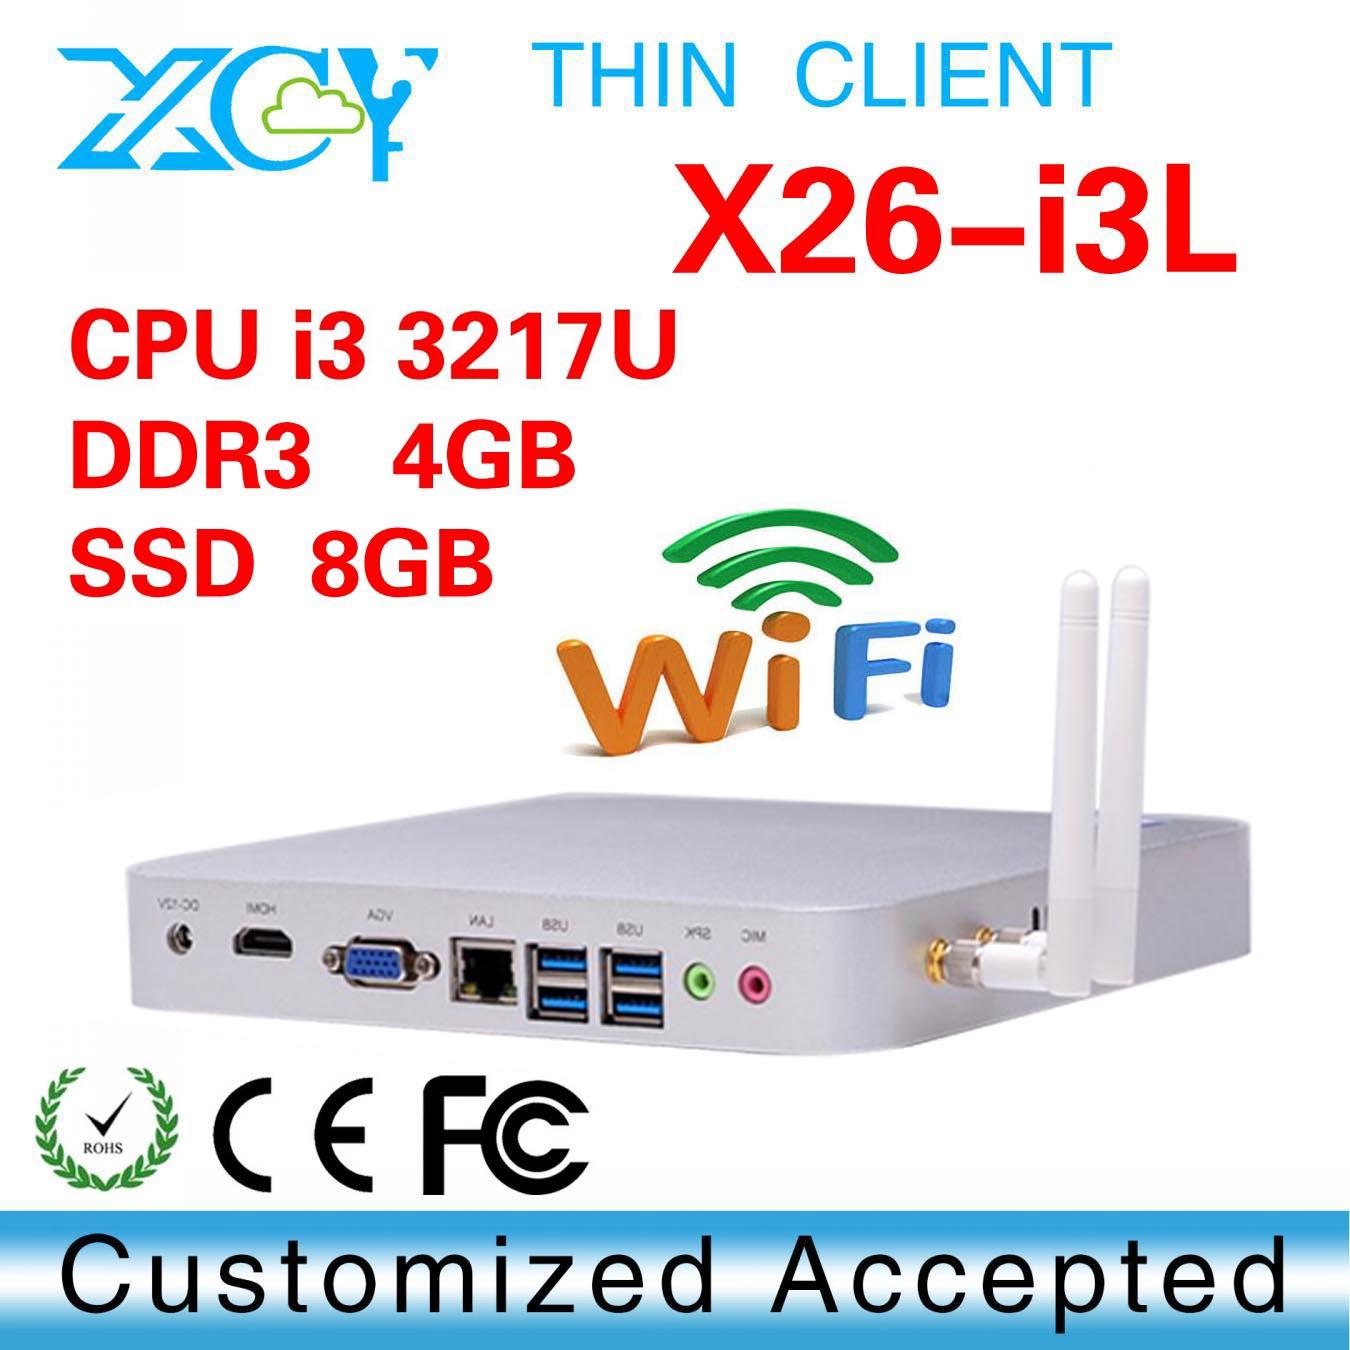 intel 3217u core dual 4GB RAM 8 GB ssd embedded PC mini desktop fanless thin client linux support performance 3D graphics(China (Mainland))